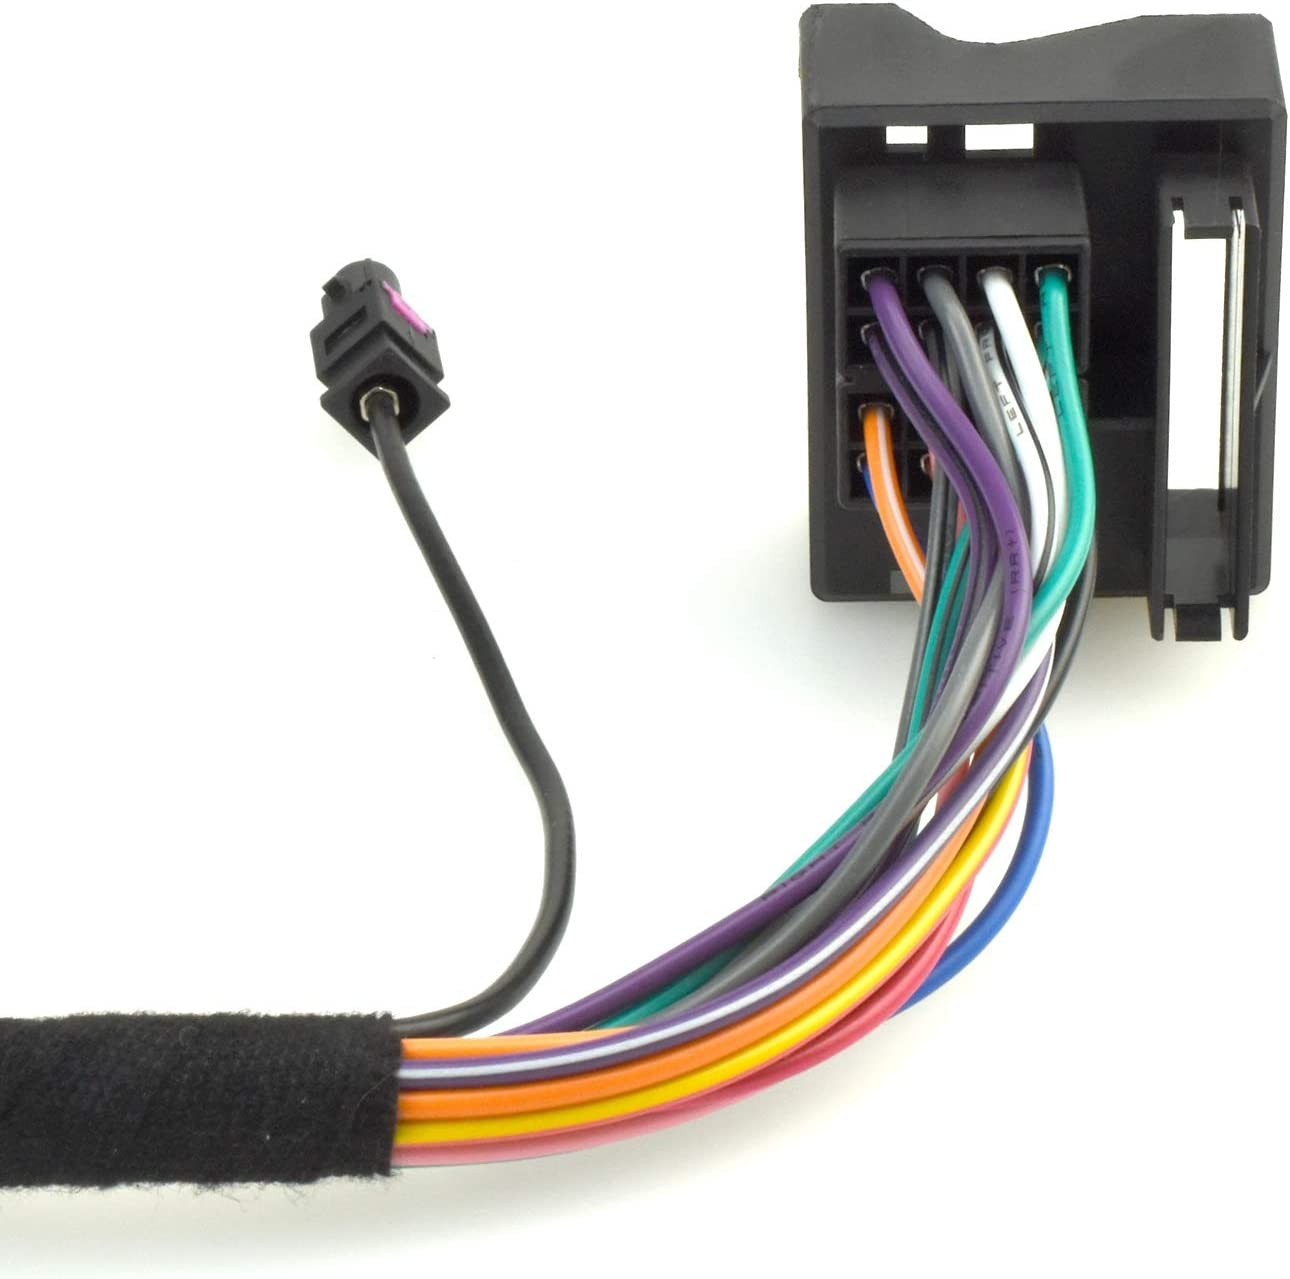 Quadlock Verlängerungskabel 6 5m Kompatibel Mit Bmw 3 Elektronik